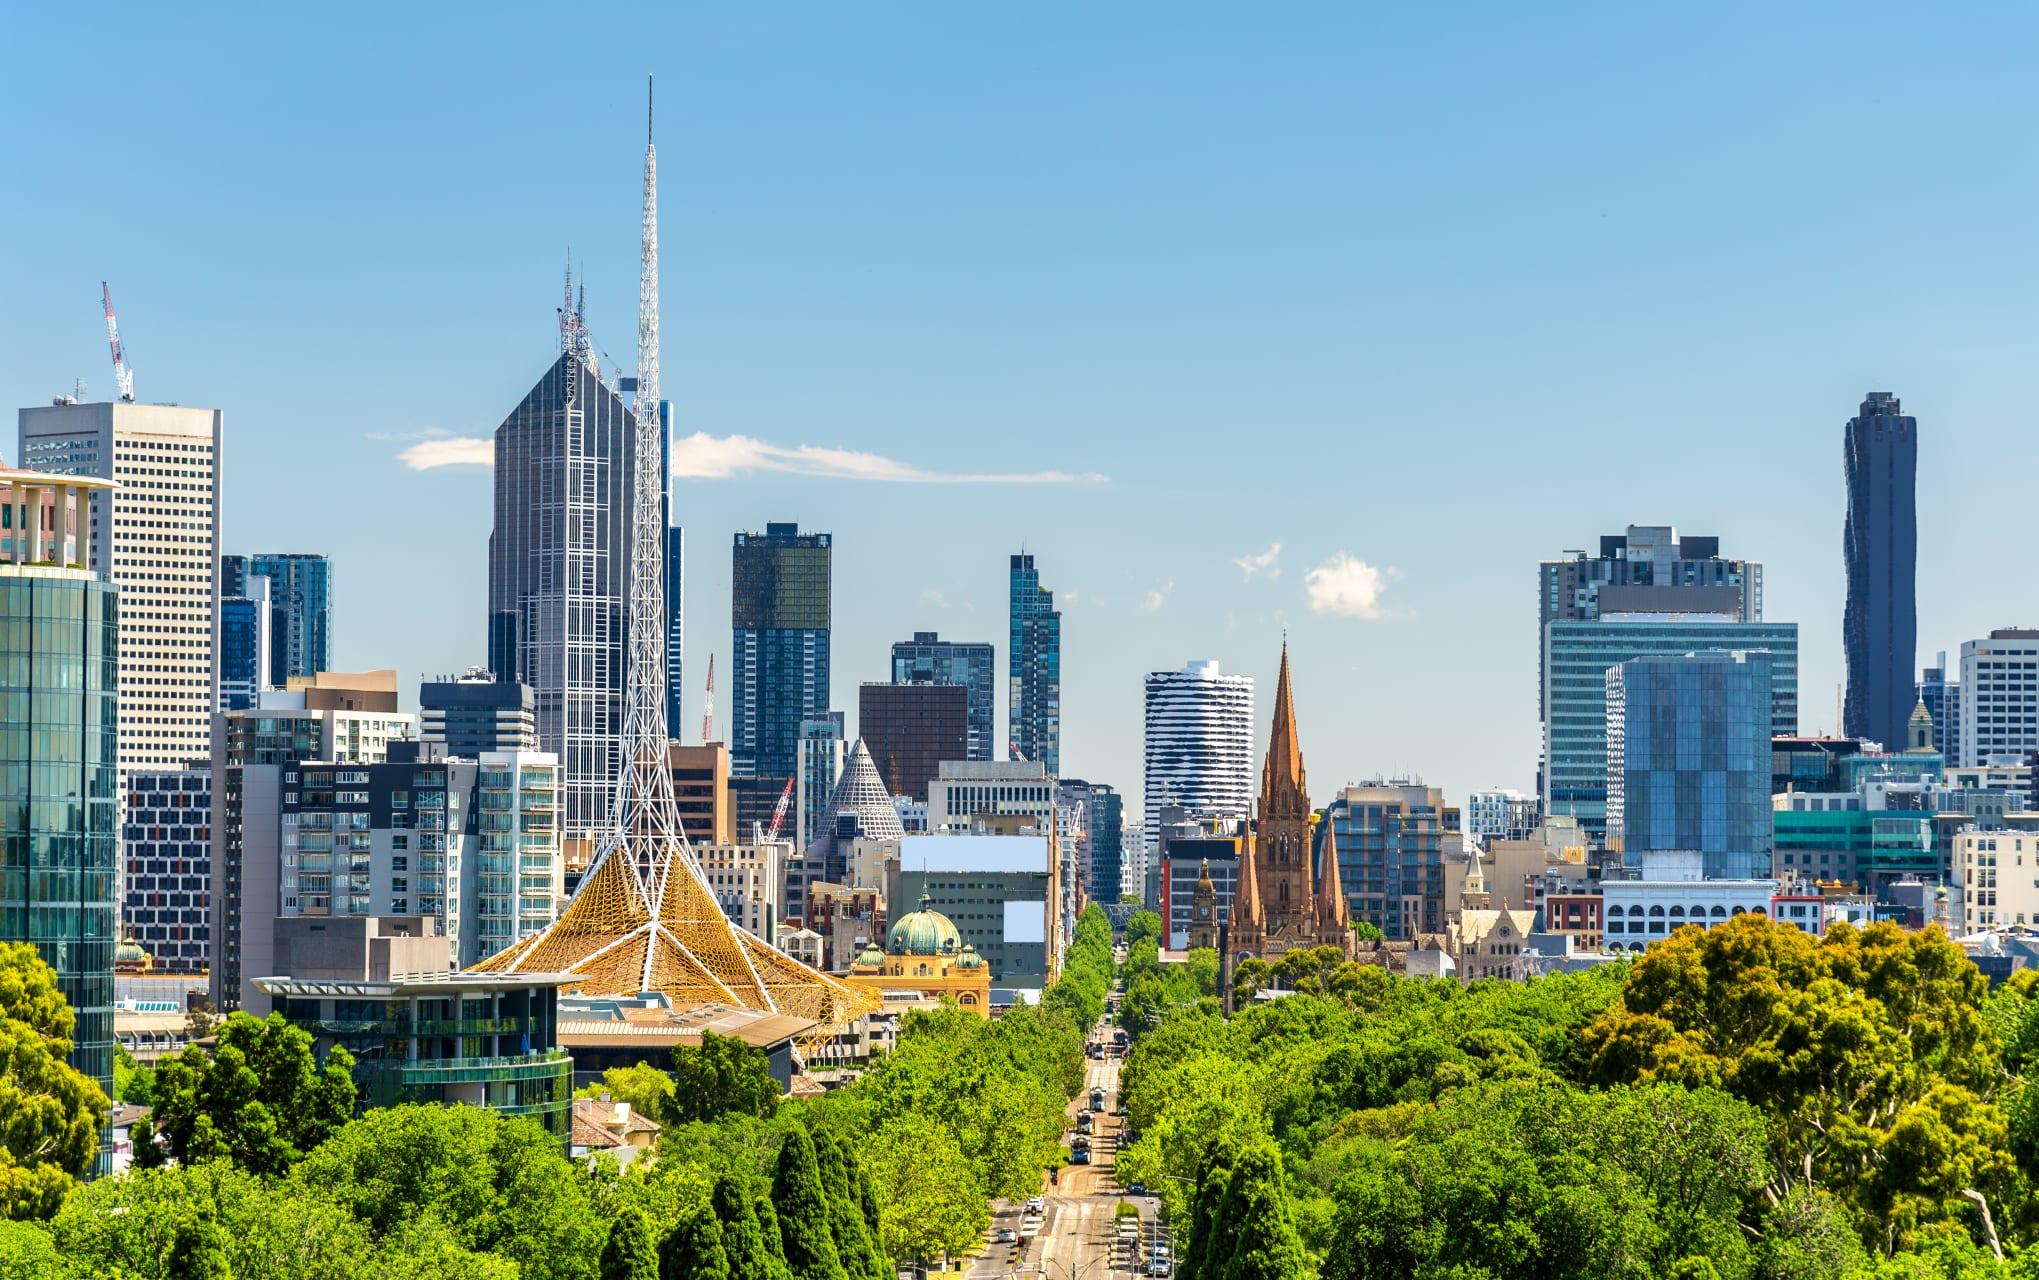 Melbourne - Culture Down Under: An Introduction to Australia's Culture Capital